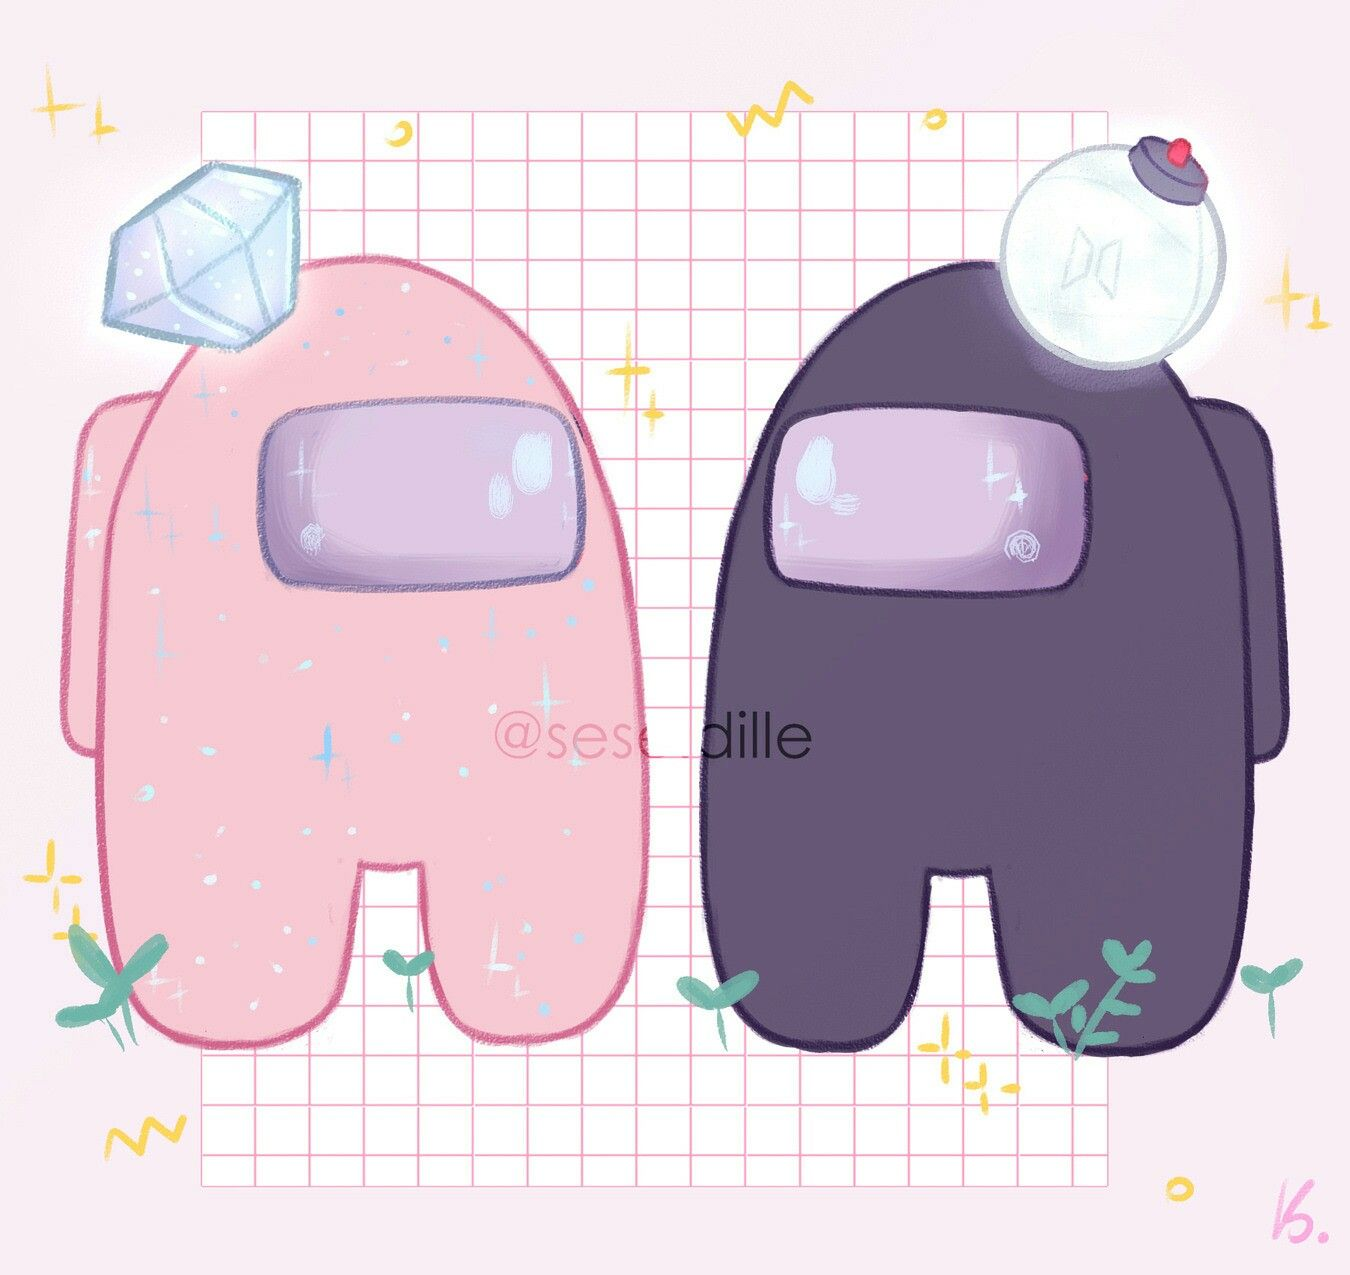 Among Us Cute Cartoon Wallpapers Cute Art Styles Cute Stickers